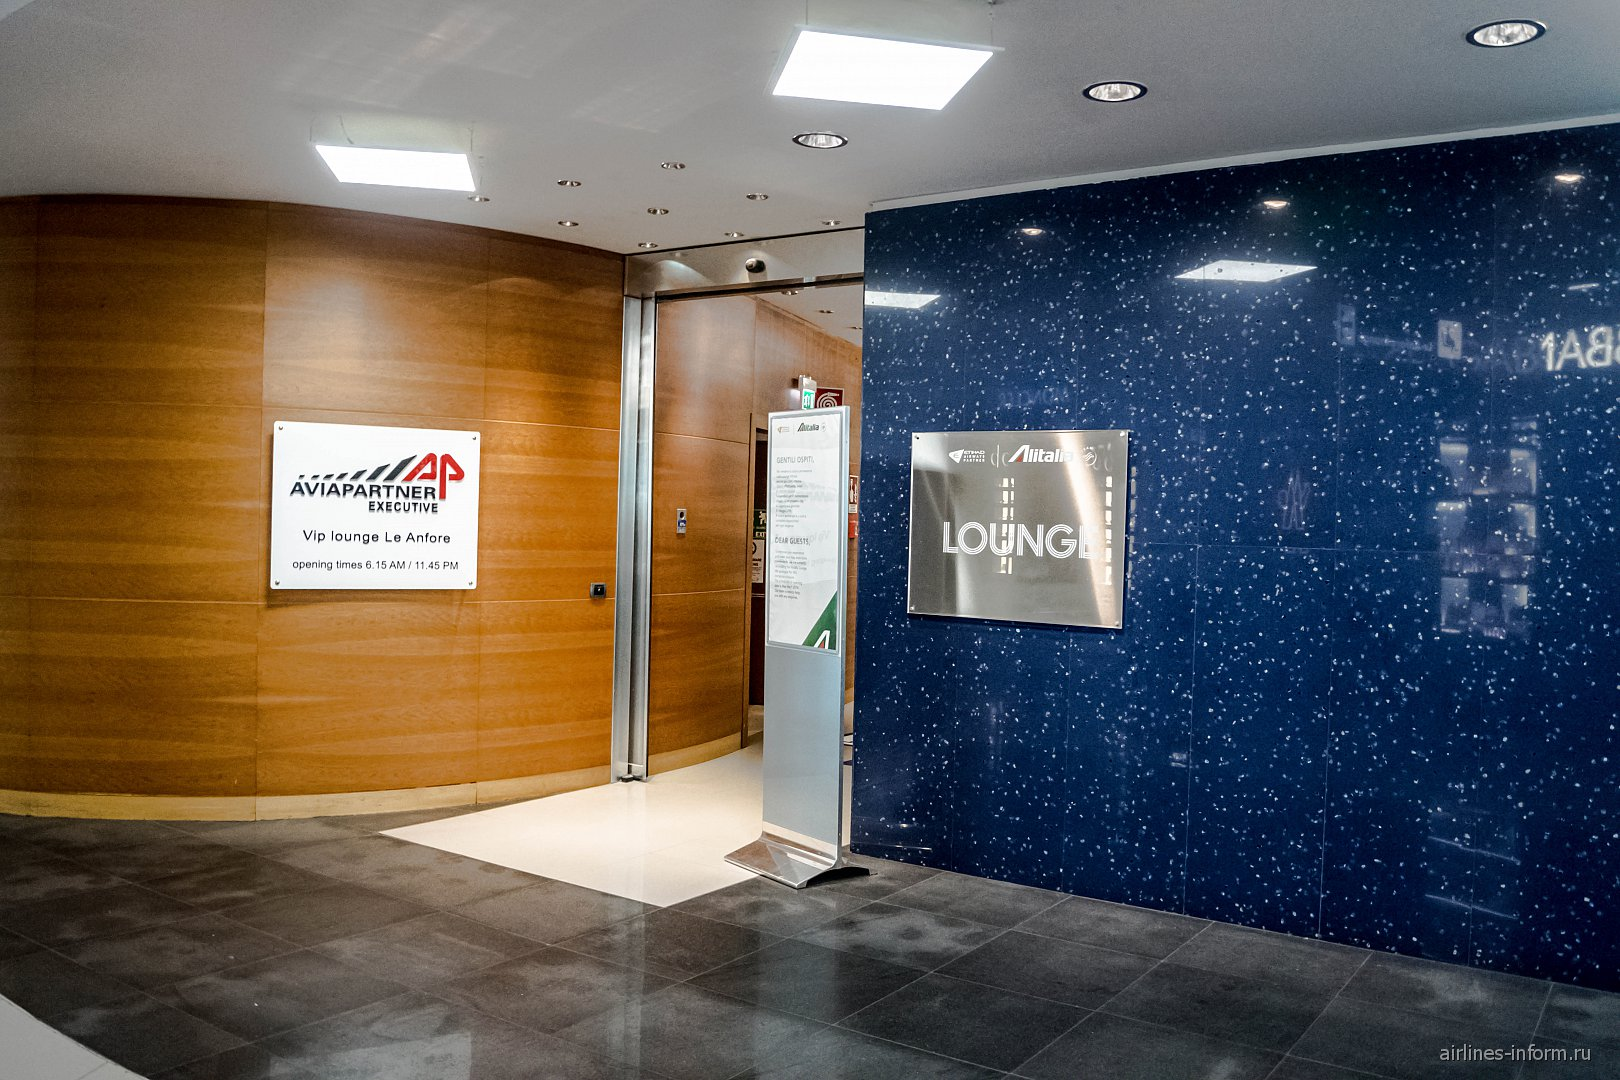 "Вход в бизнес-зал ""Le Anfore"" авиакомпании Alitalia в аэропорту Рим Фьюмичино"